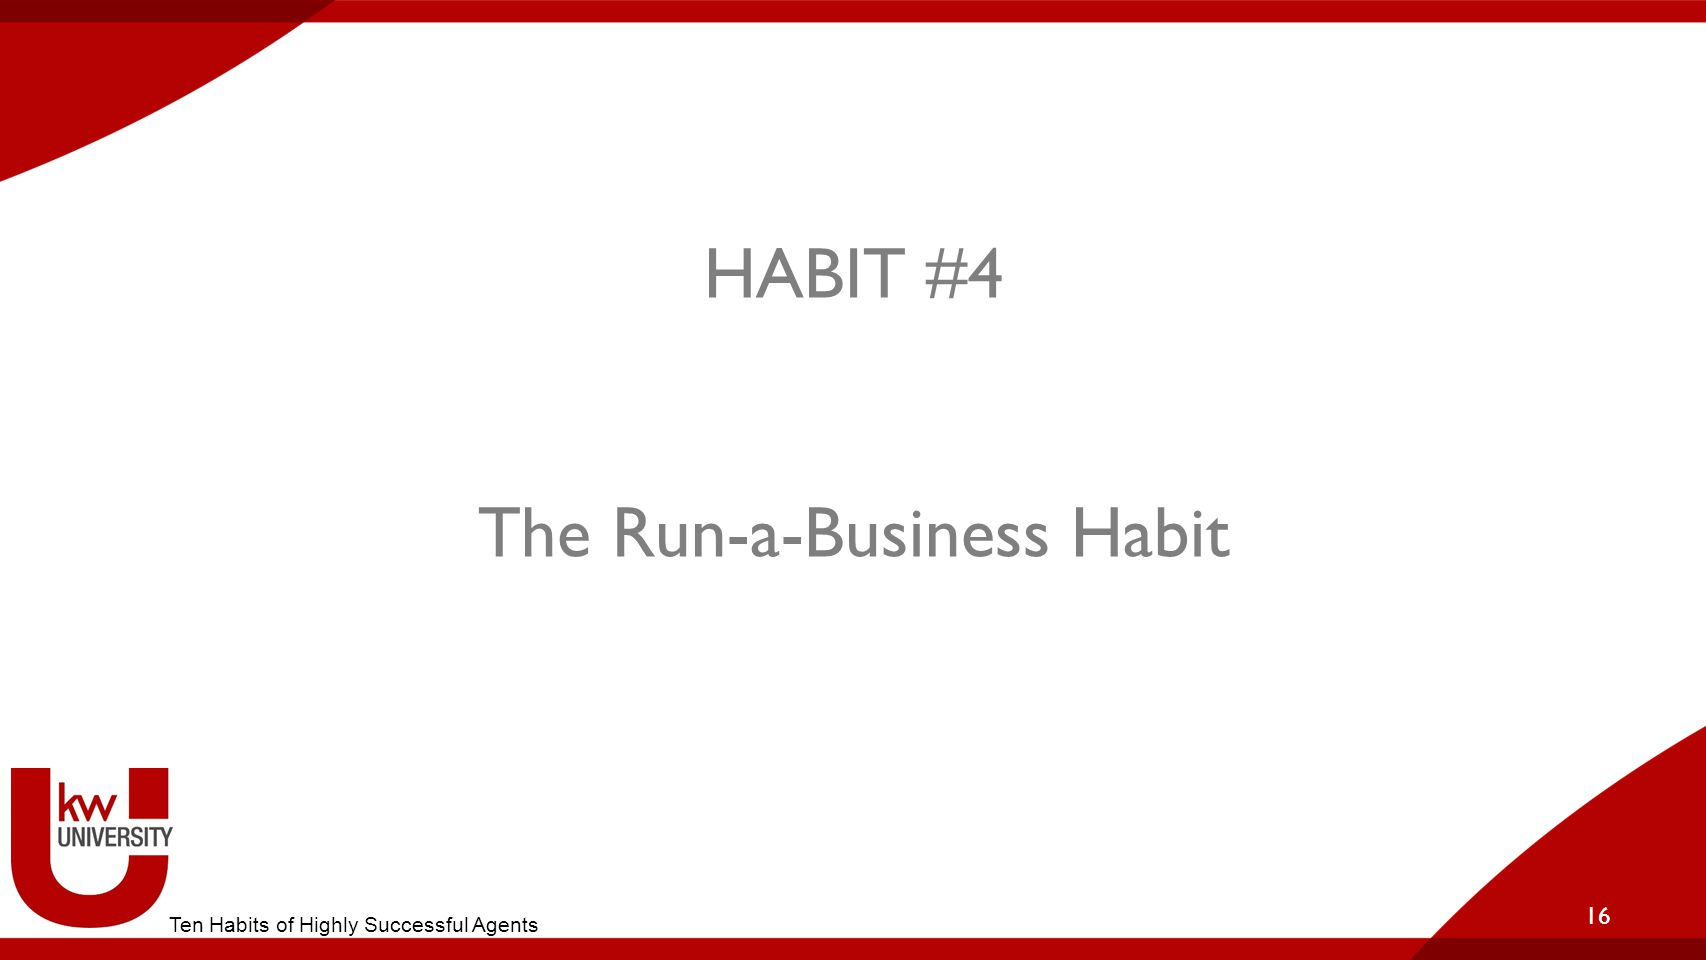 HABIT #4 The Run-a-Business Habit